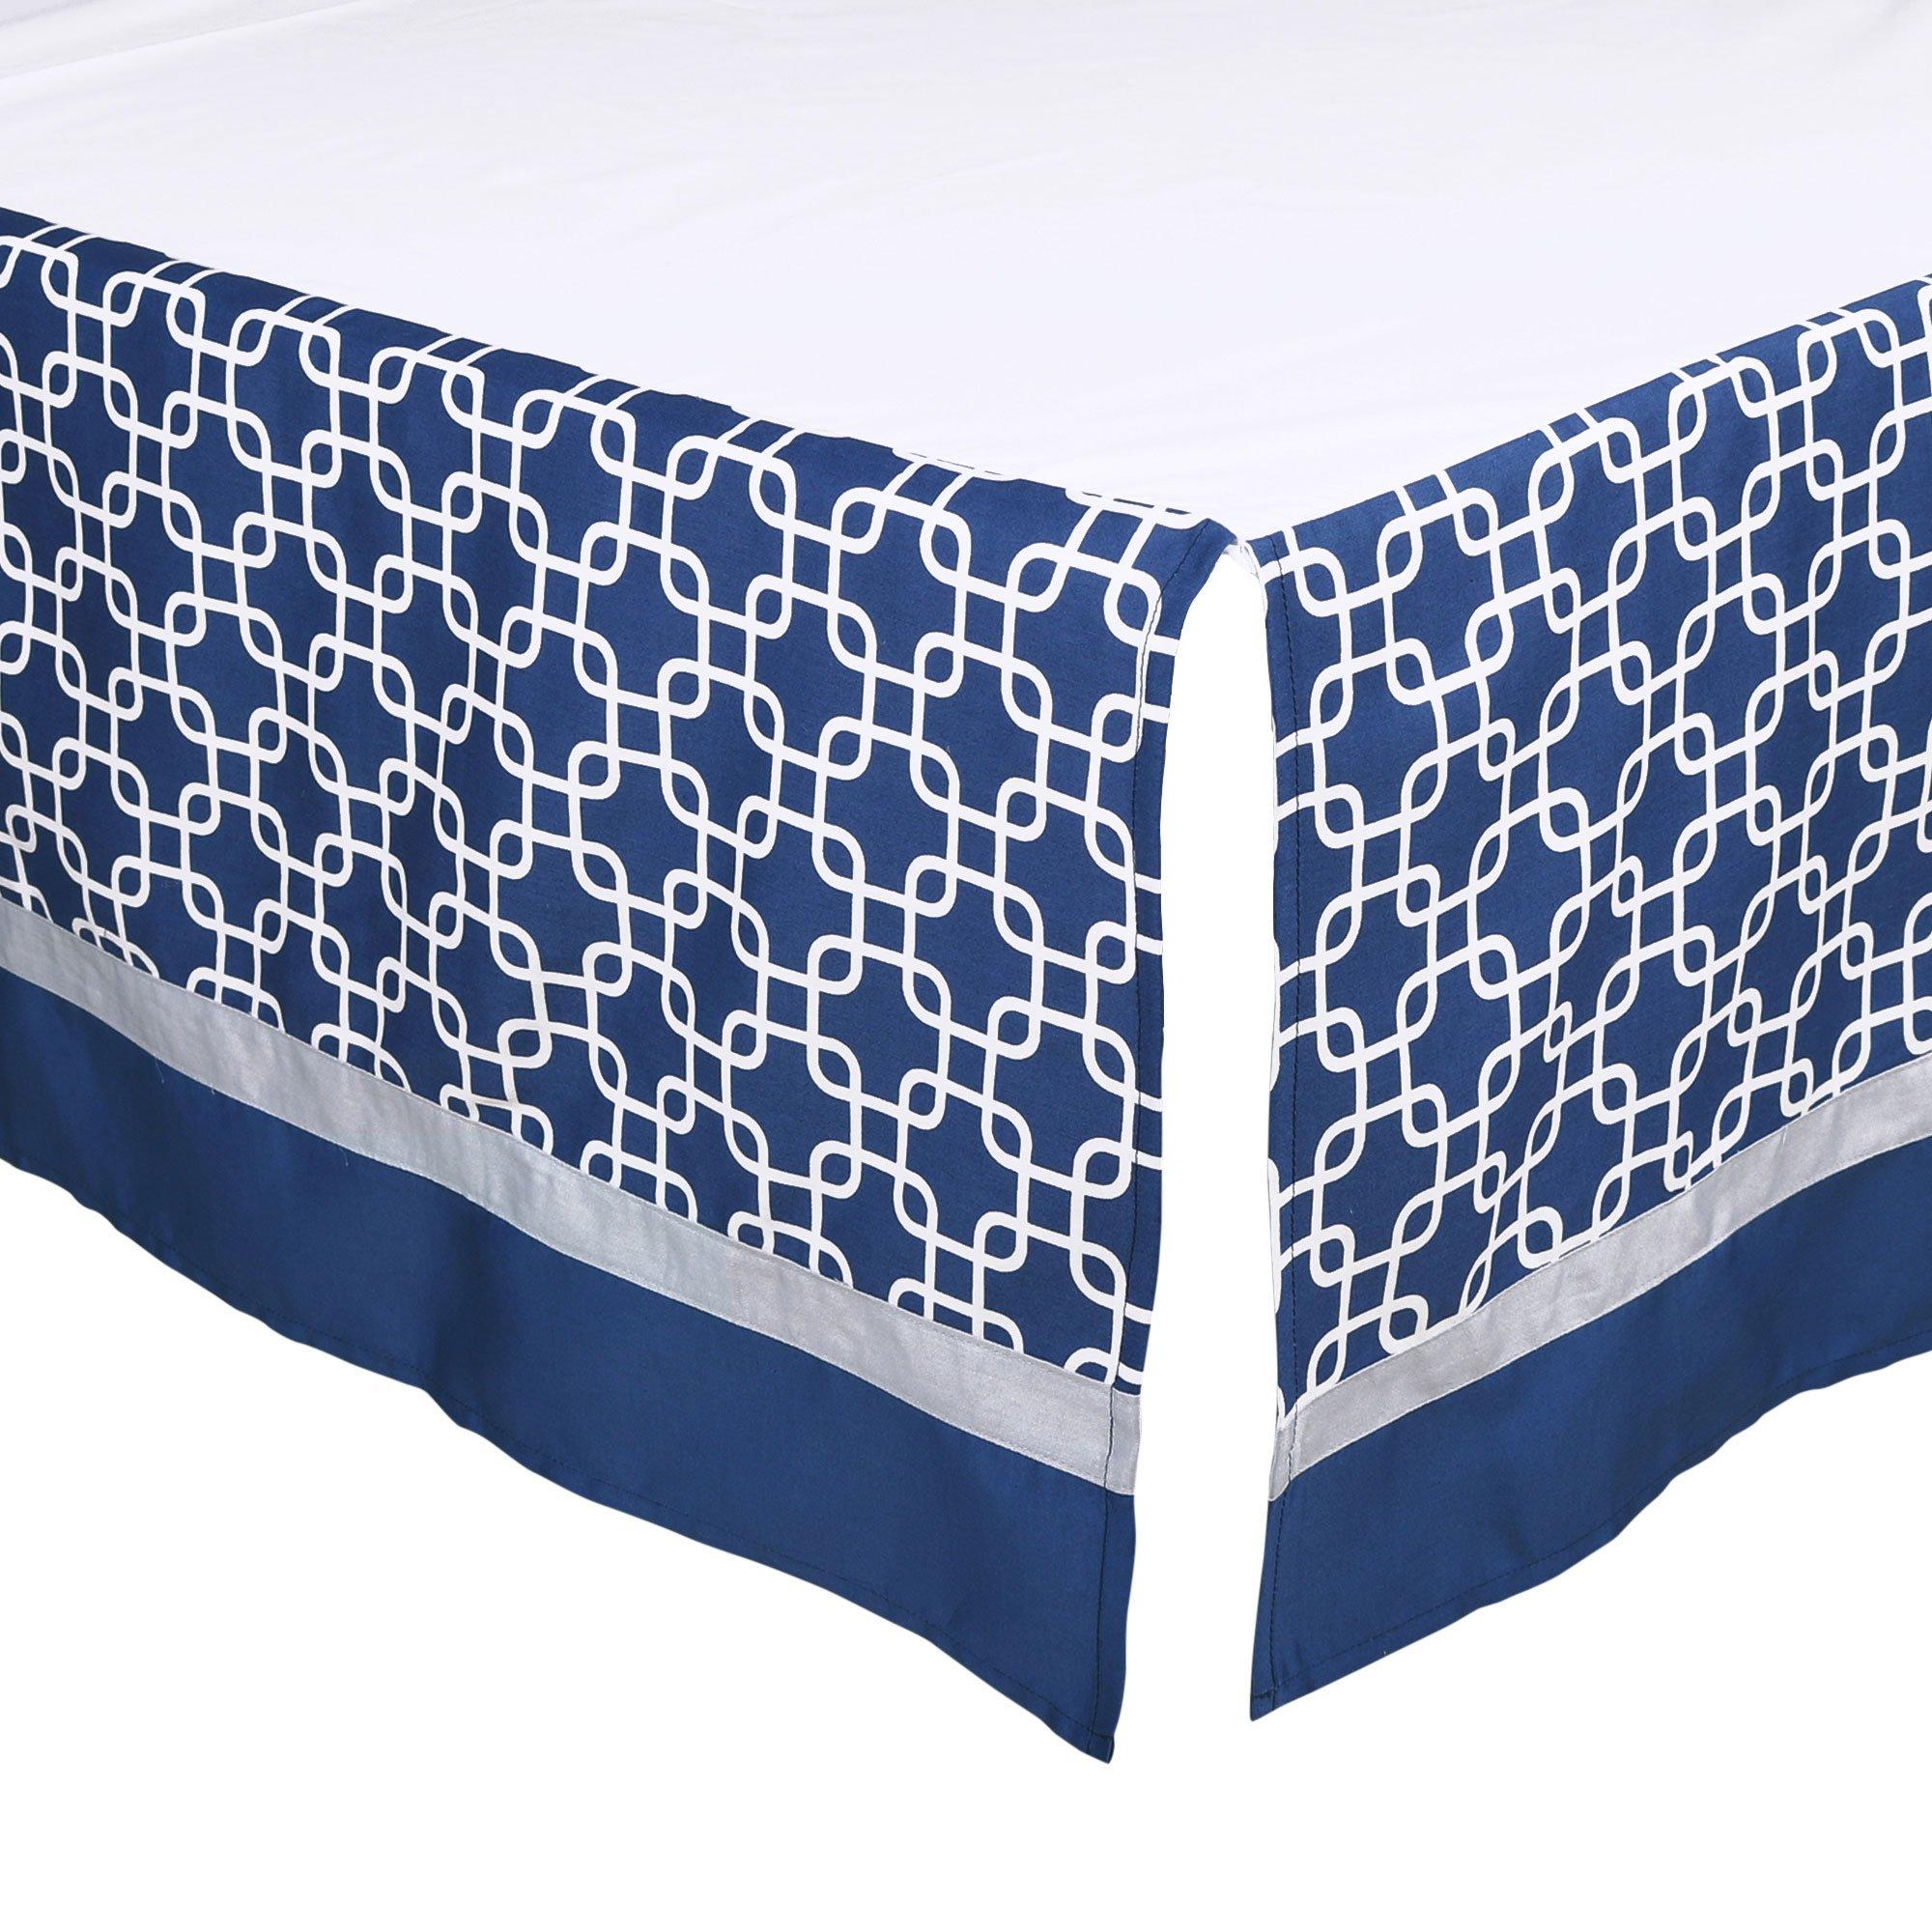 Navy Blue Geometric Print Tailored Crib Dust Ruffle by The Peanut Shell